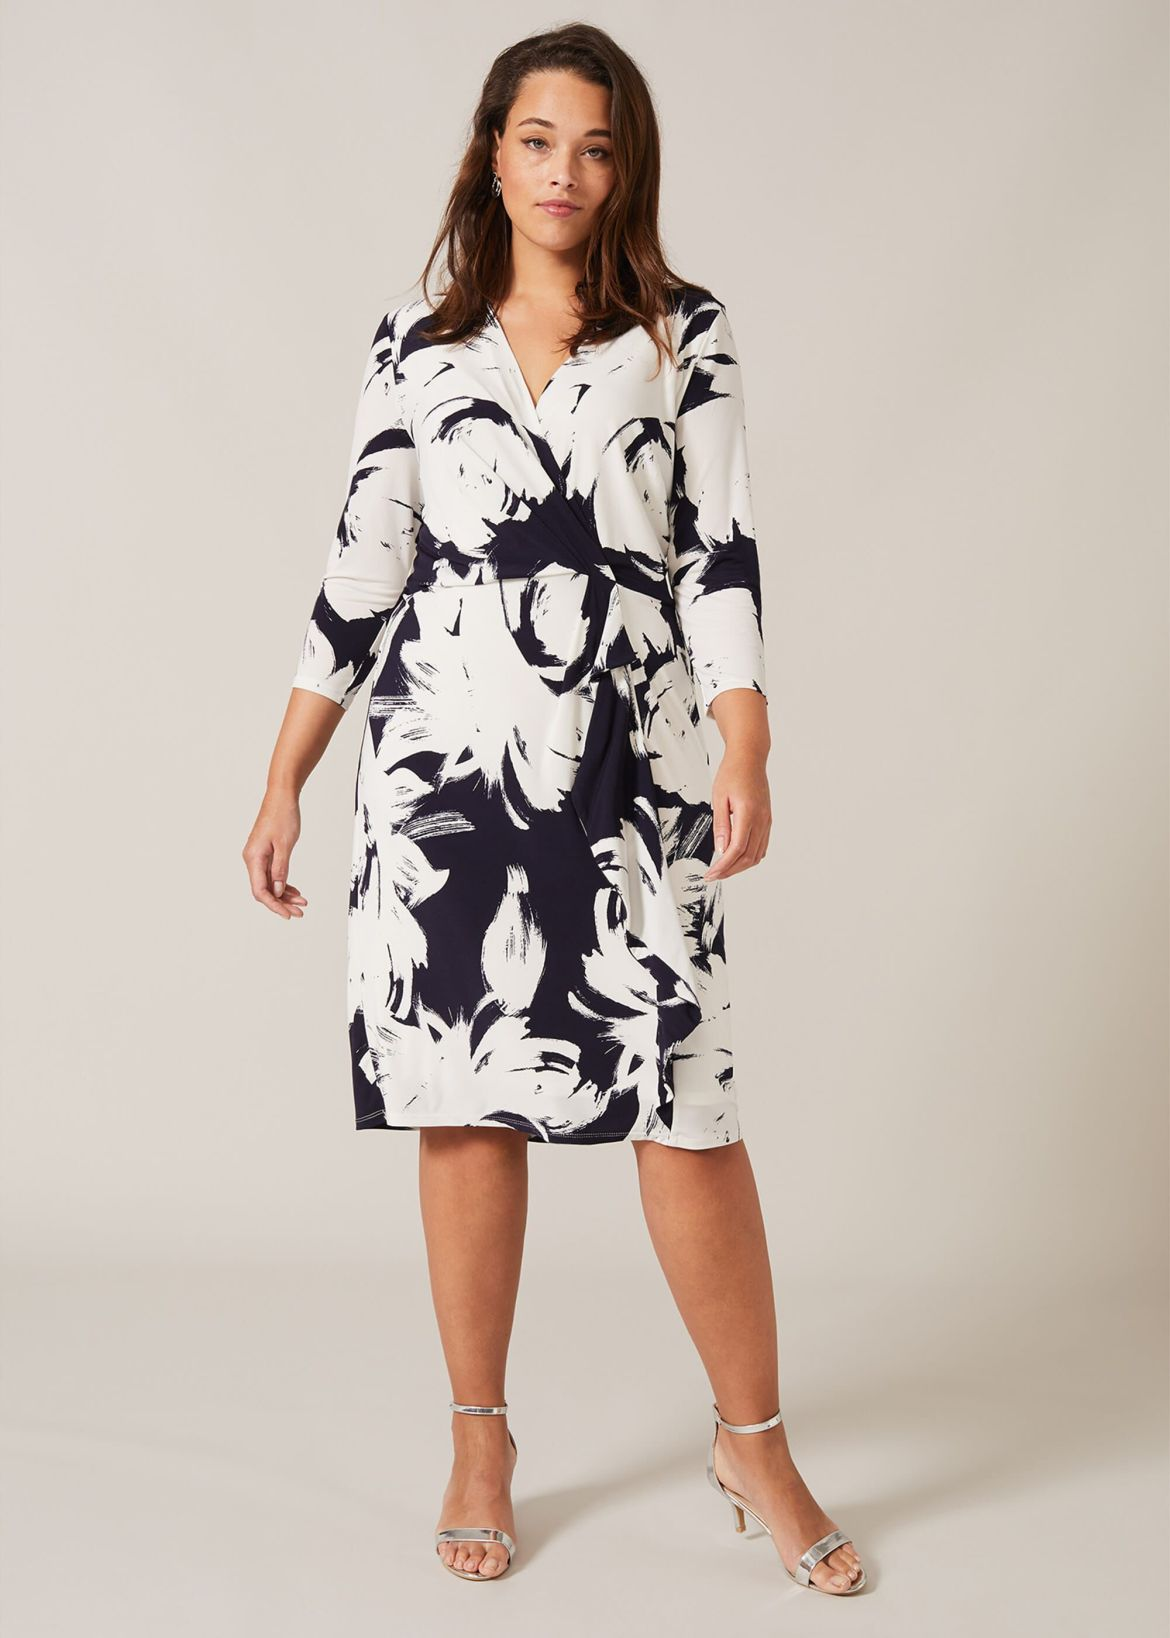 Drina Printed Dress